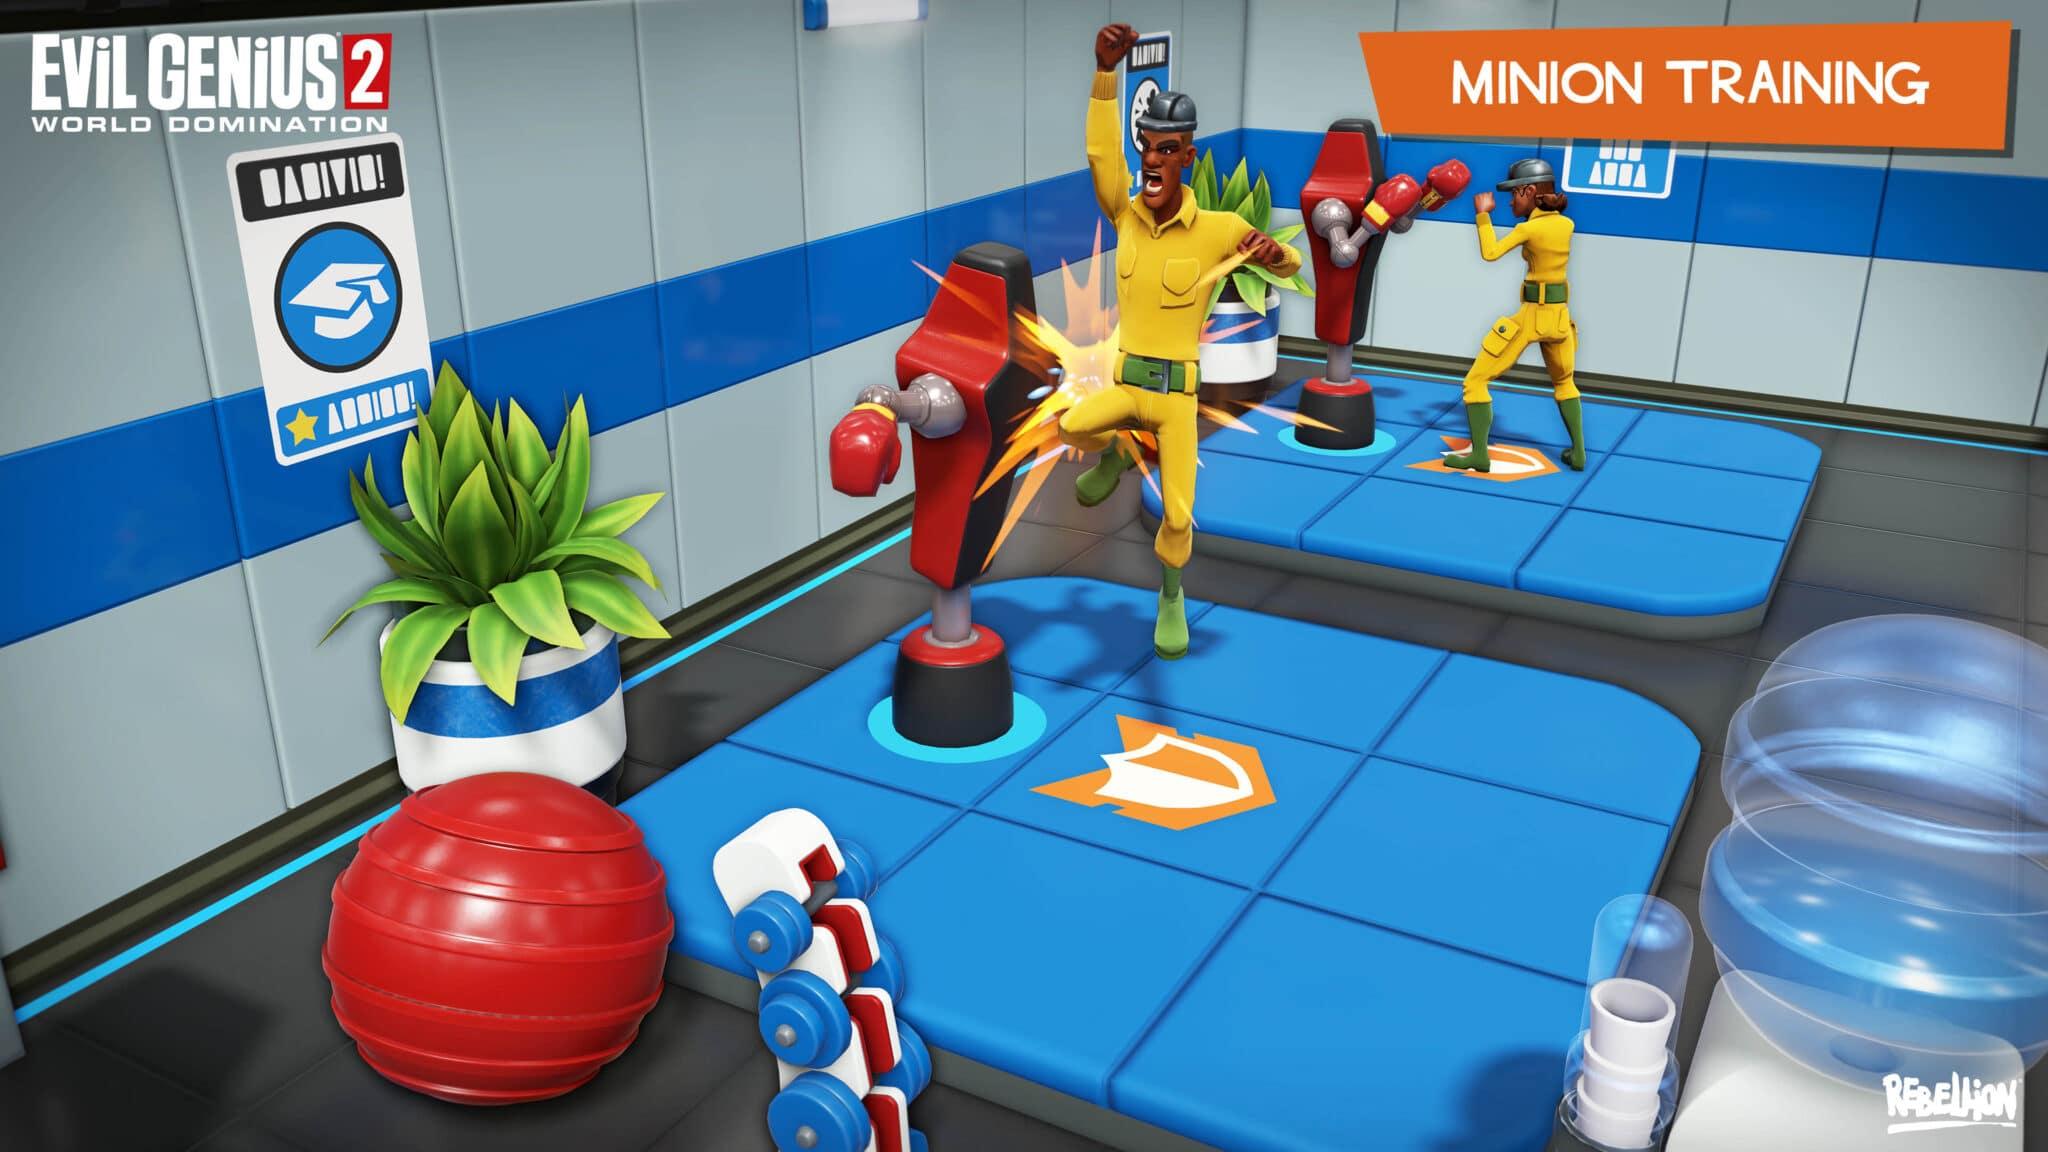 EG2 Minion Training